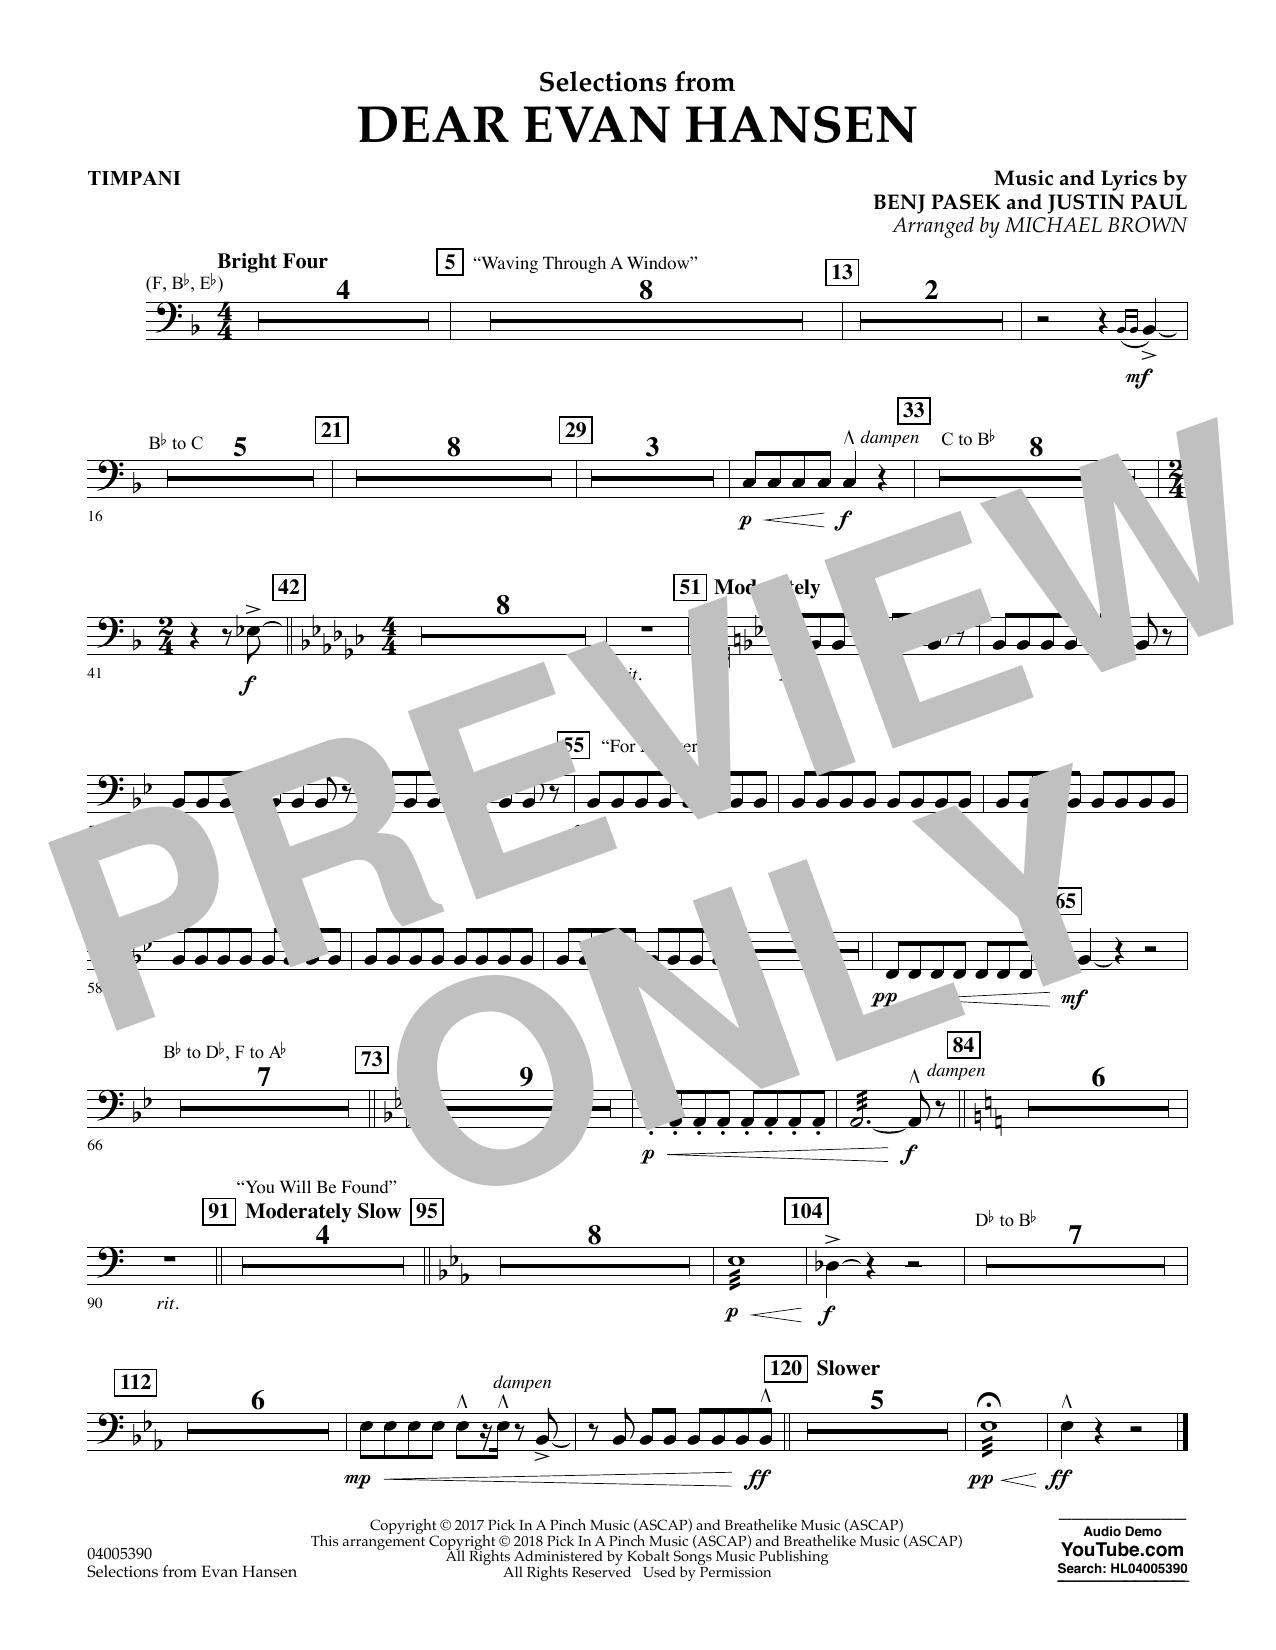 Selections from Dear Evan Hansen - Timpani (Concert Band)